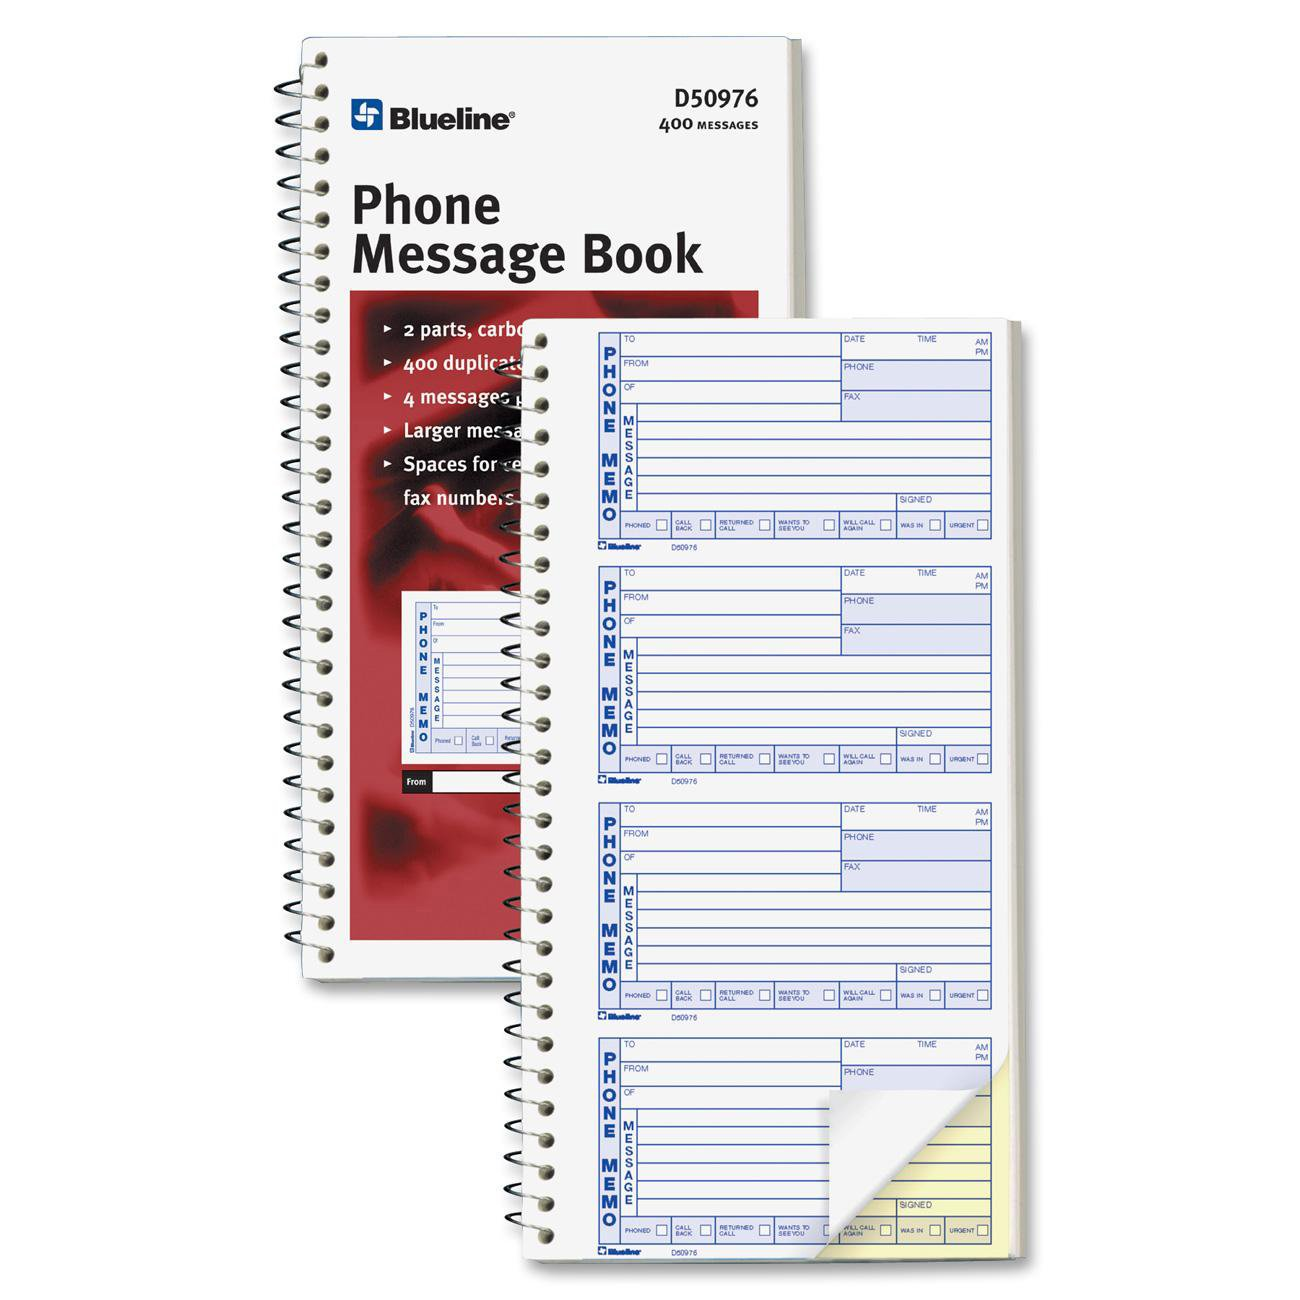 Blueline 400 Message Book - Each